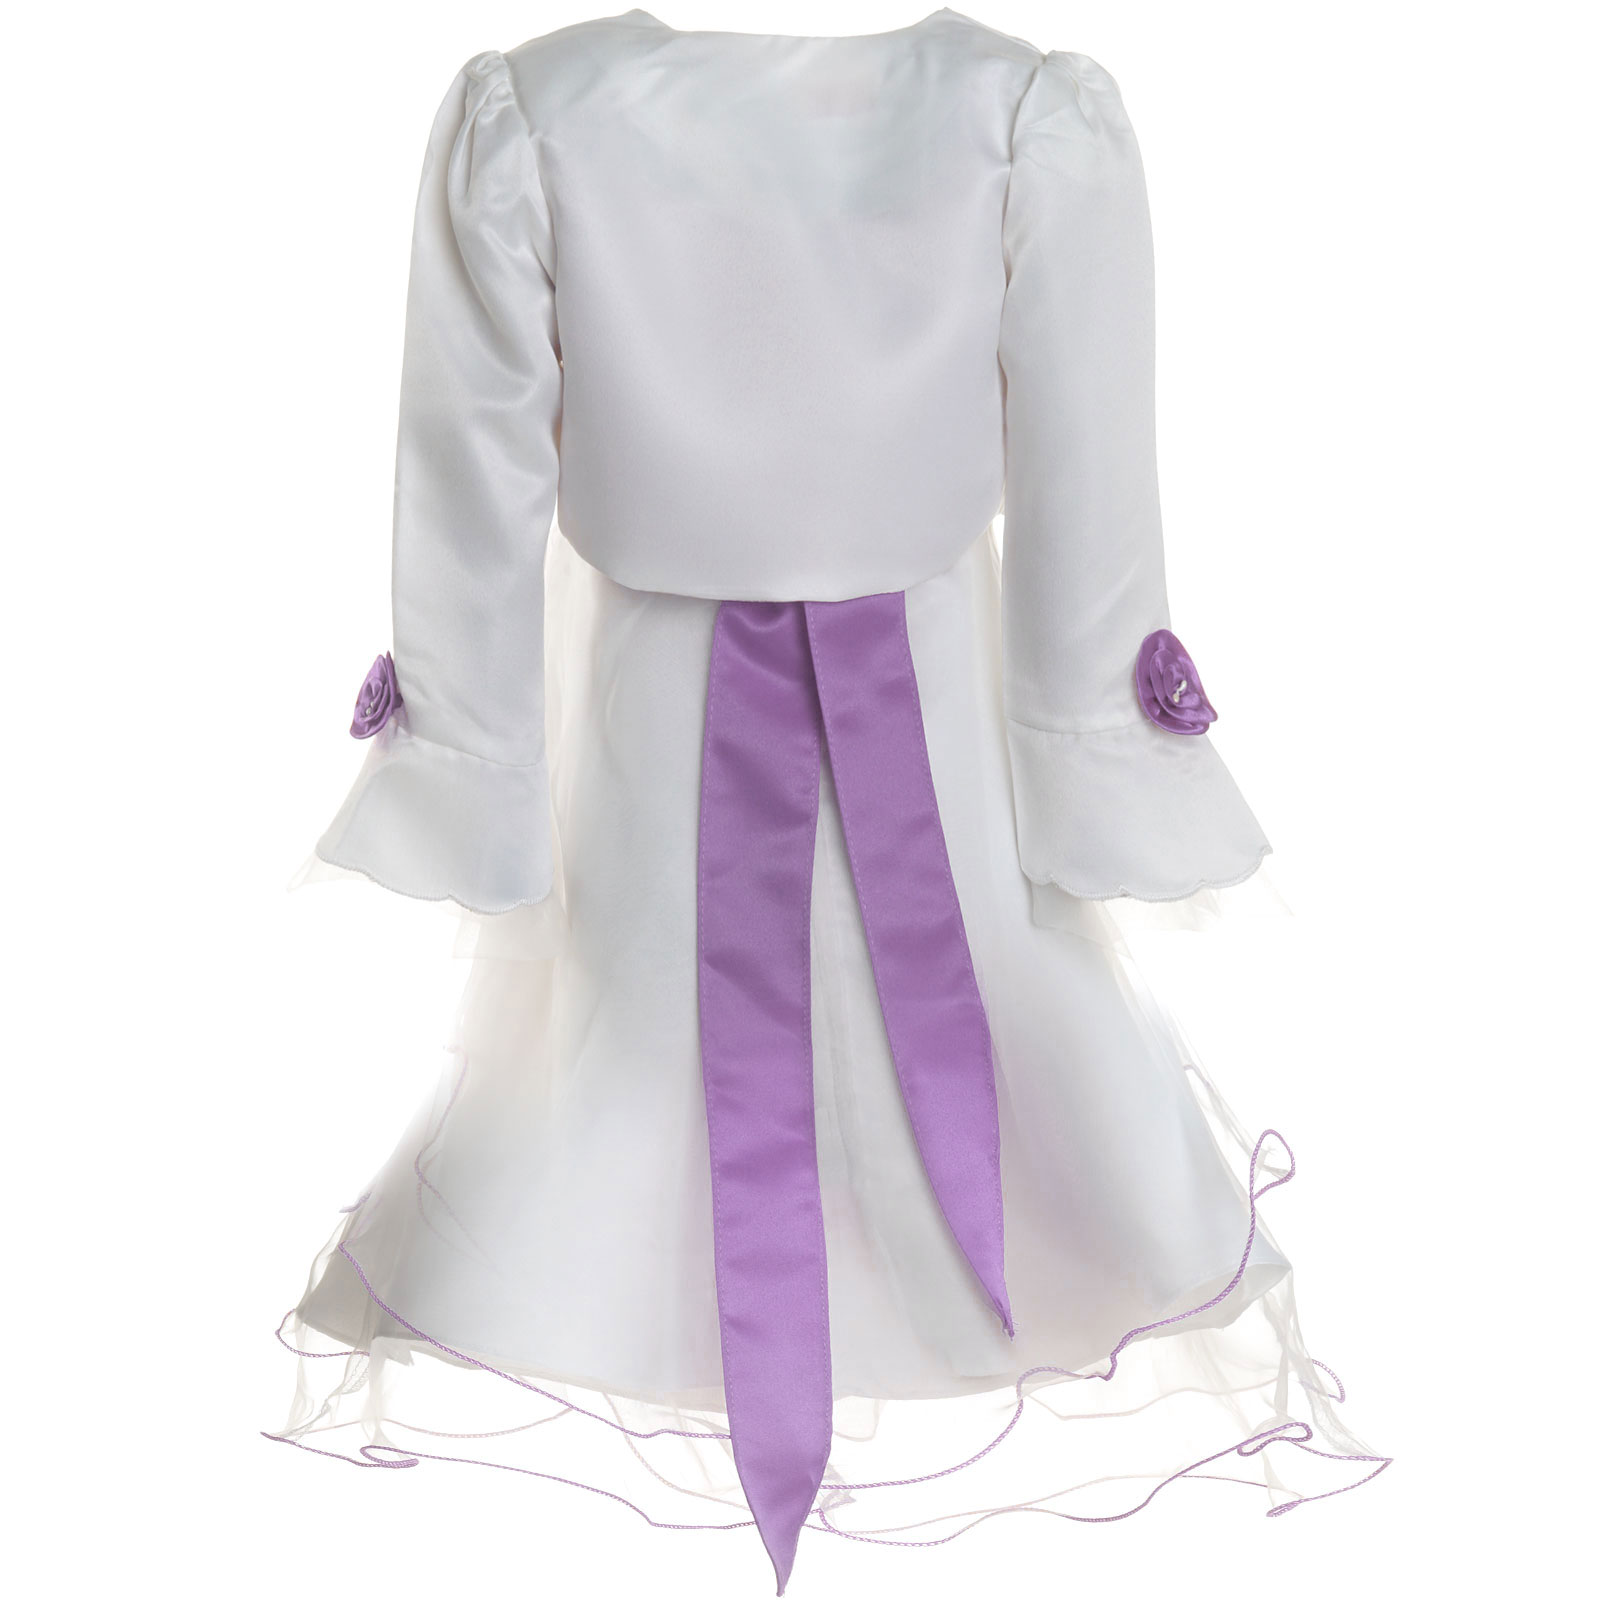 Maedchen-Kinder-Kleid-Peticoat-Festkleid-Lang-Arm-Kostuem-mit-Bolero-Rose-21476 Indexbild 7